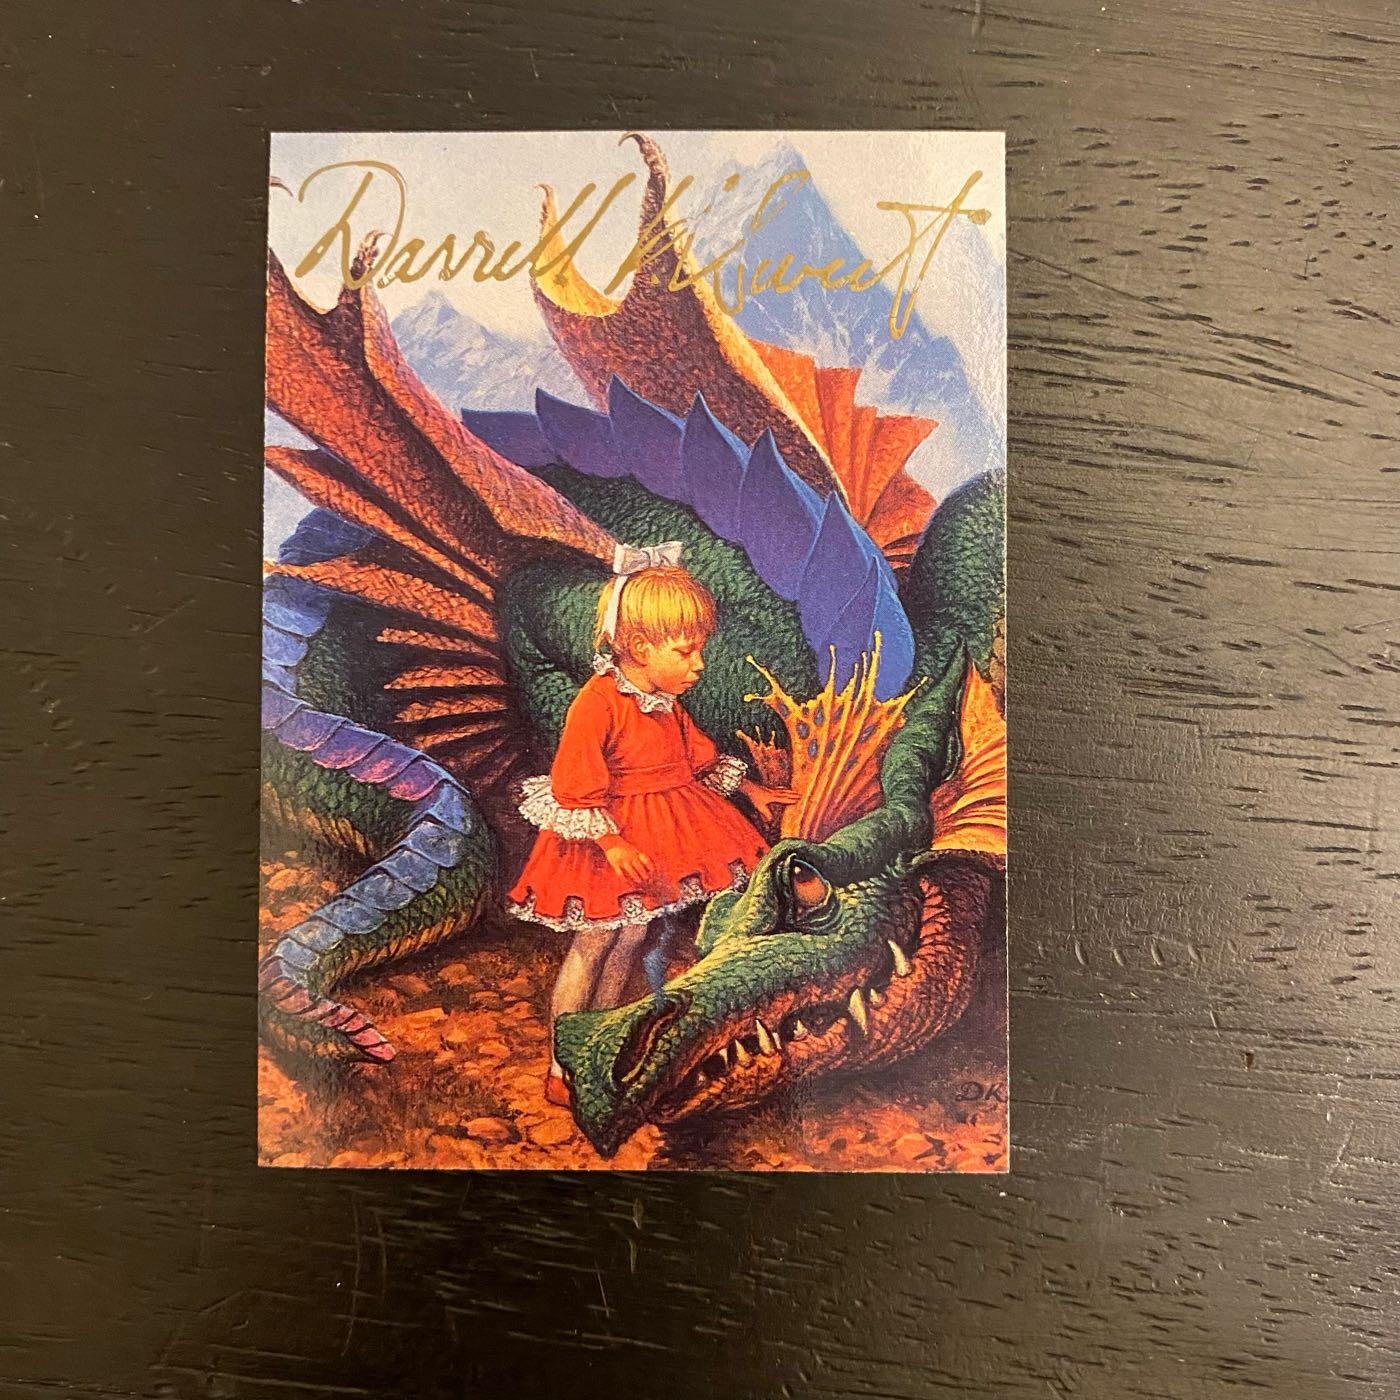 1994 FPG DKS Darrell K Sweet 美國專業插畫家 雨果獎提名 親筆簽名 收藏卡 卡片